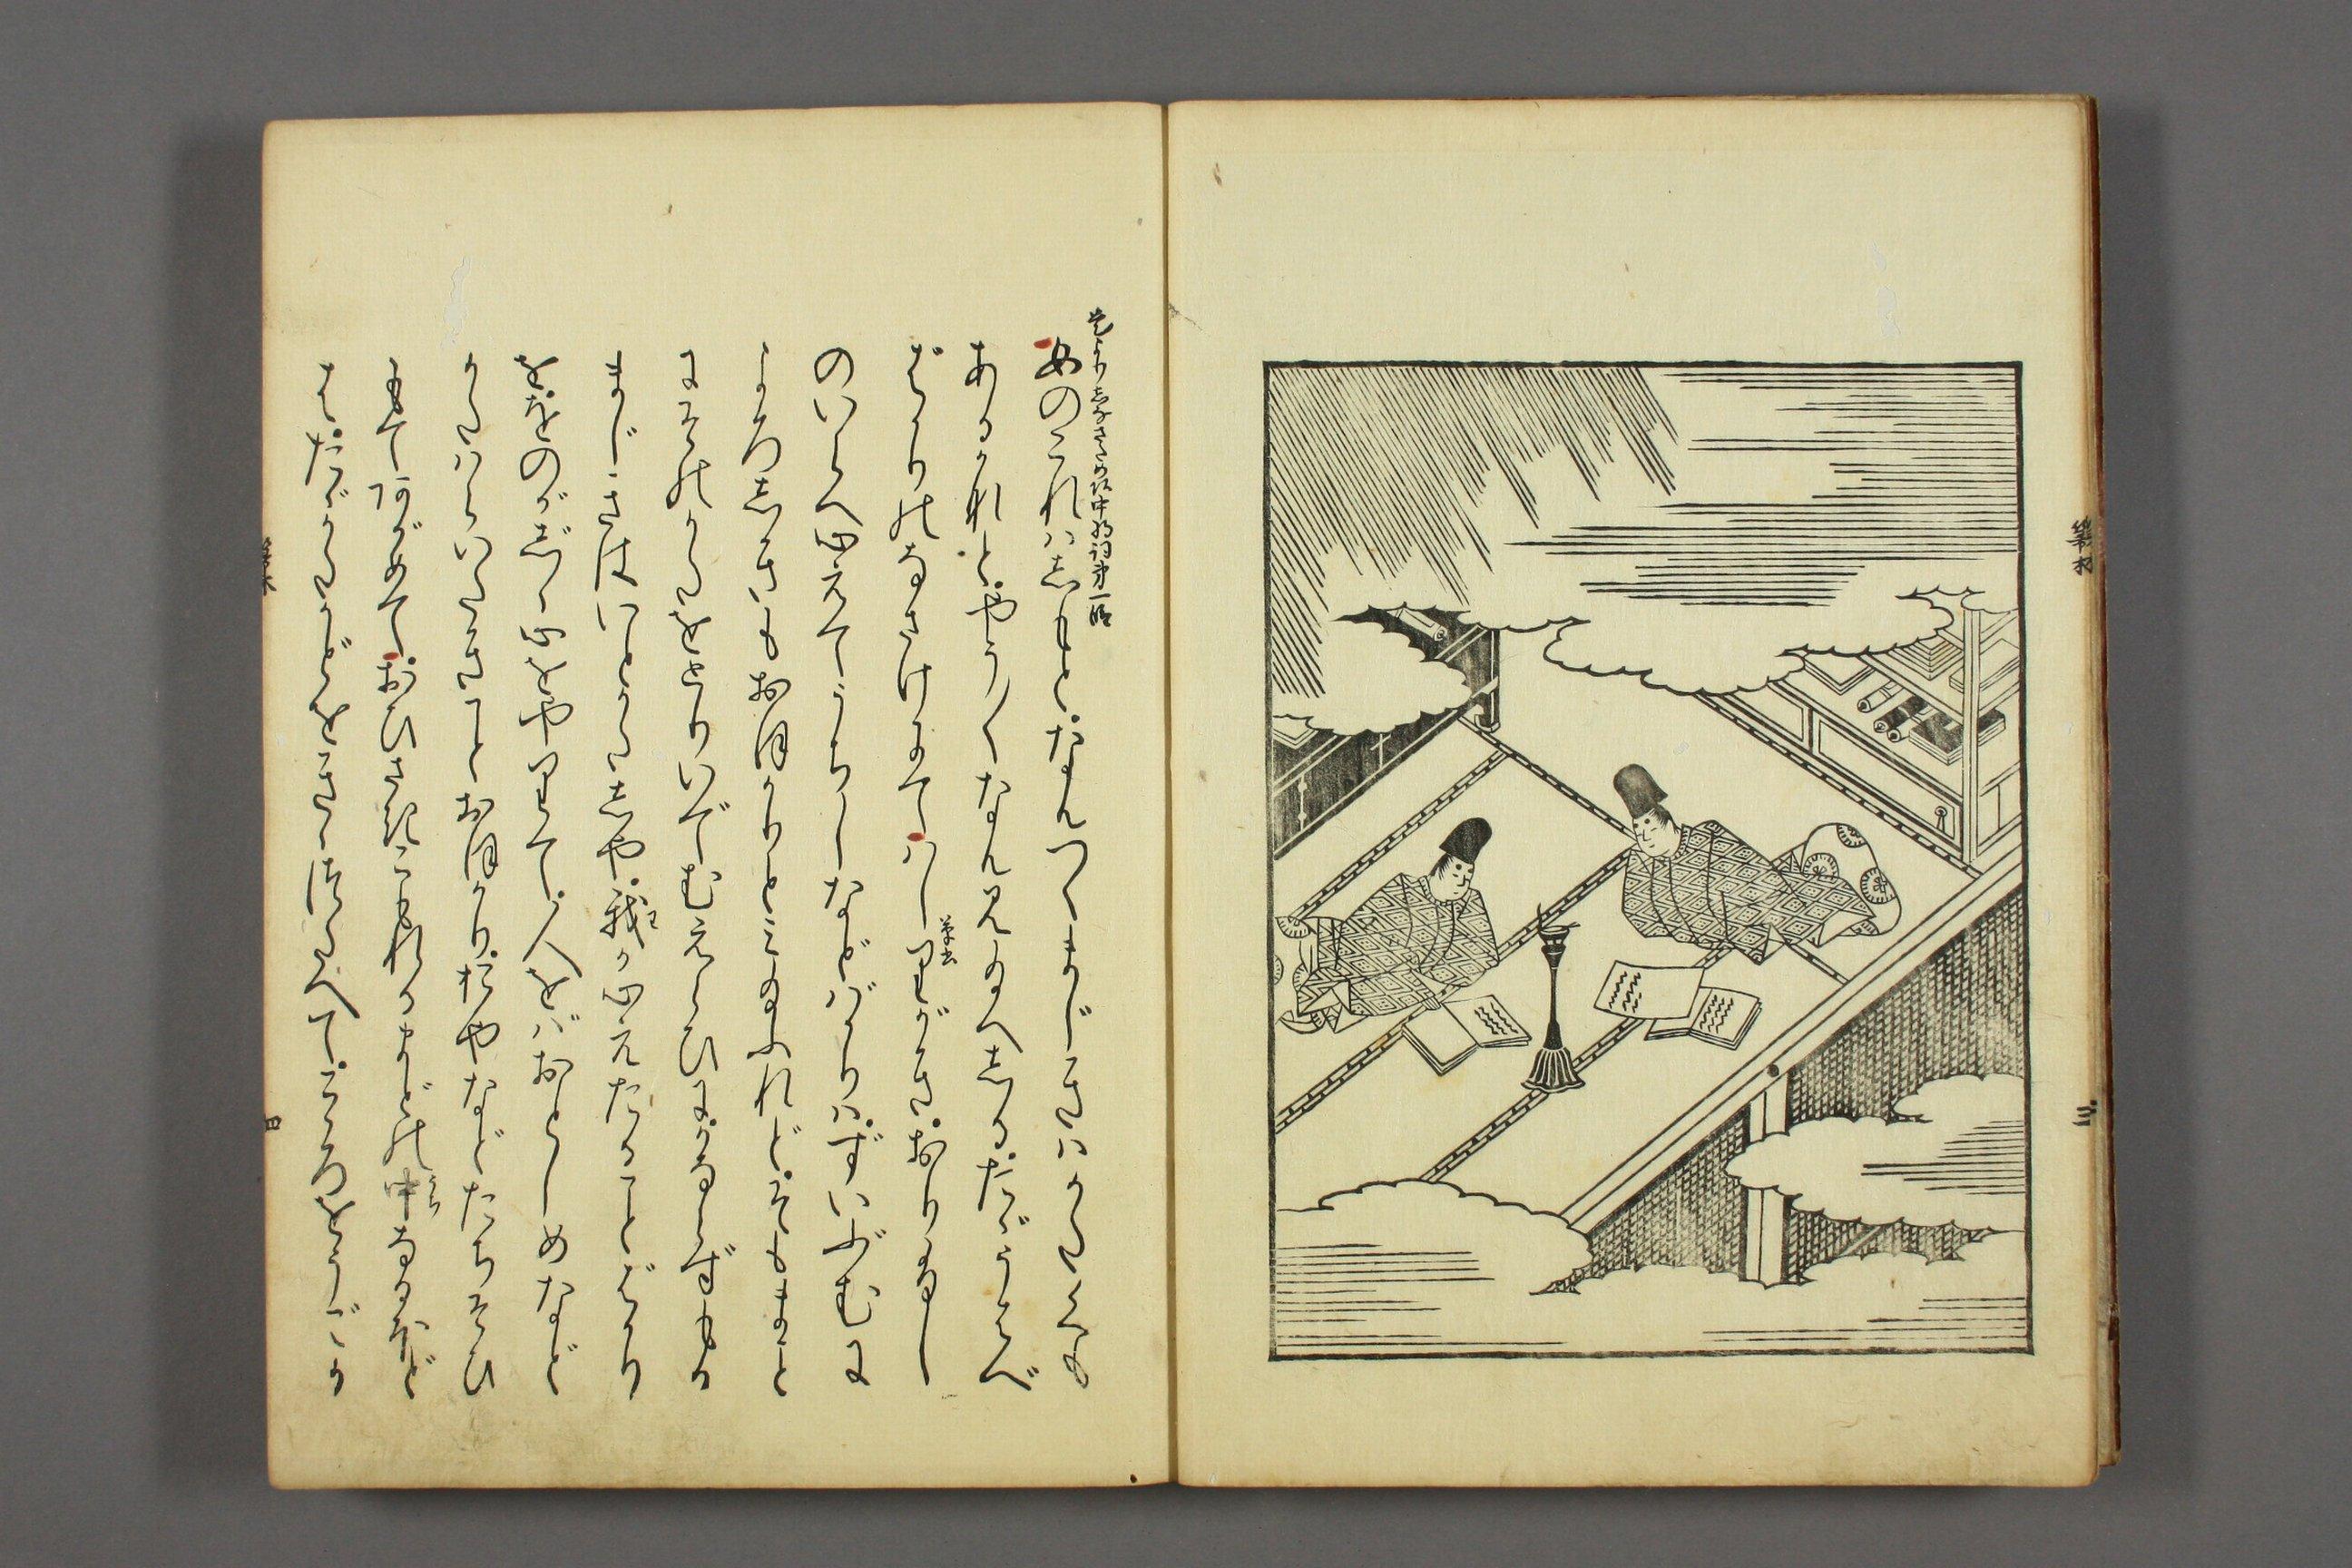 http://archive.wul.waseda.ac.jp/kosho/bunko30/bunko30_a0007/bunko30_a0007_0002/bunko30_a0007_0002_p0005.jpg